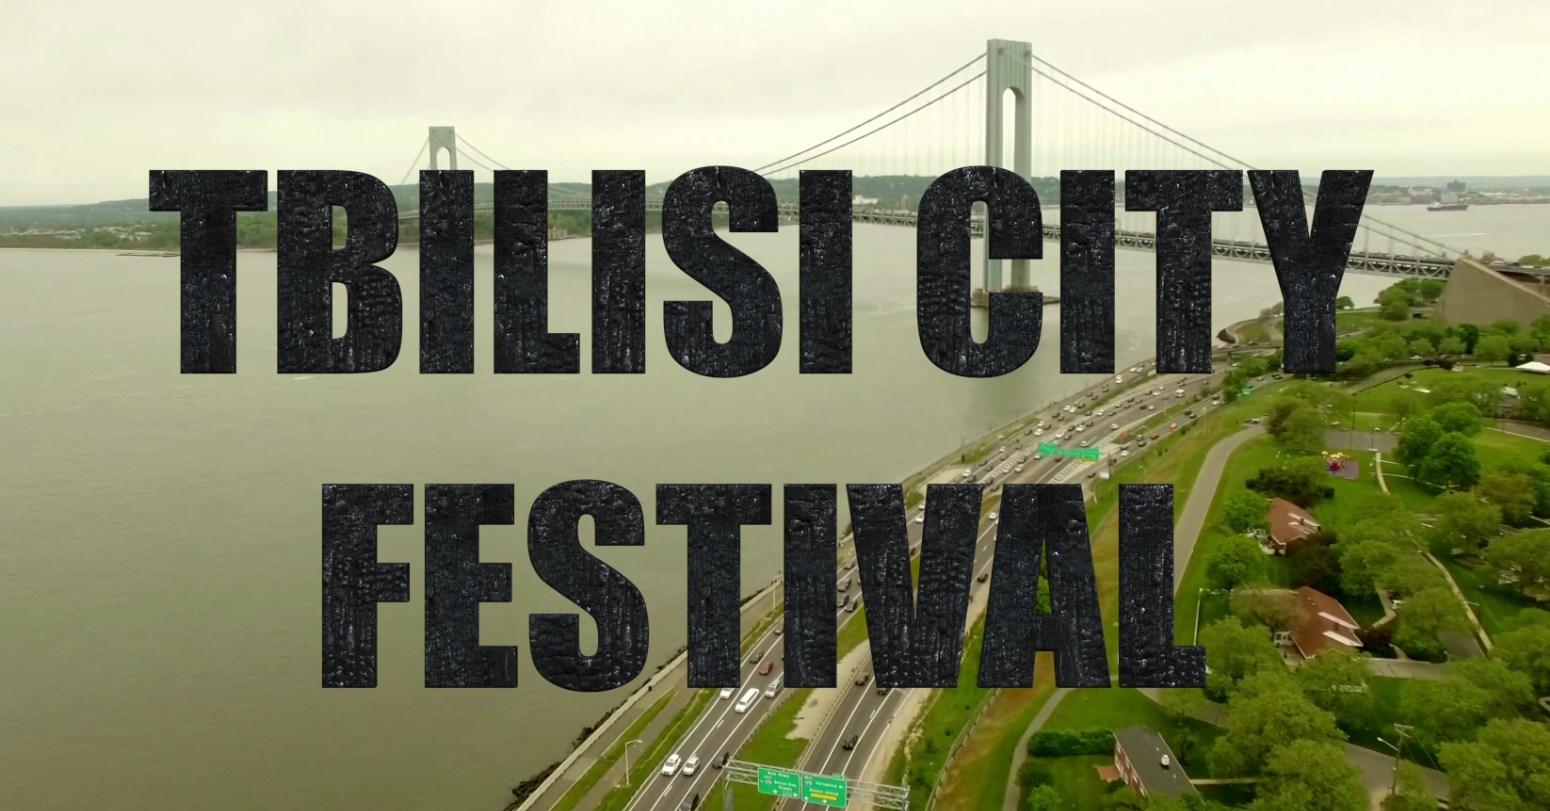 TBILISOBA - Tbilisi City Festival